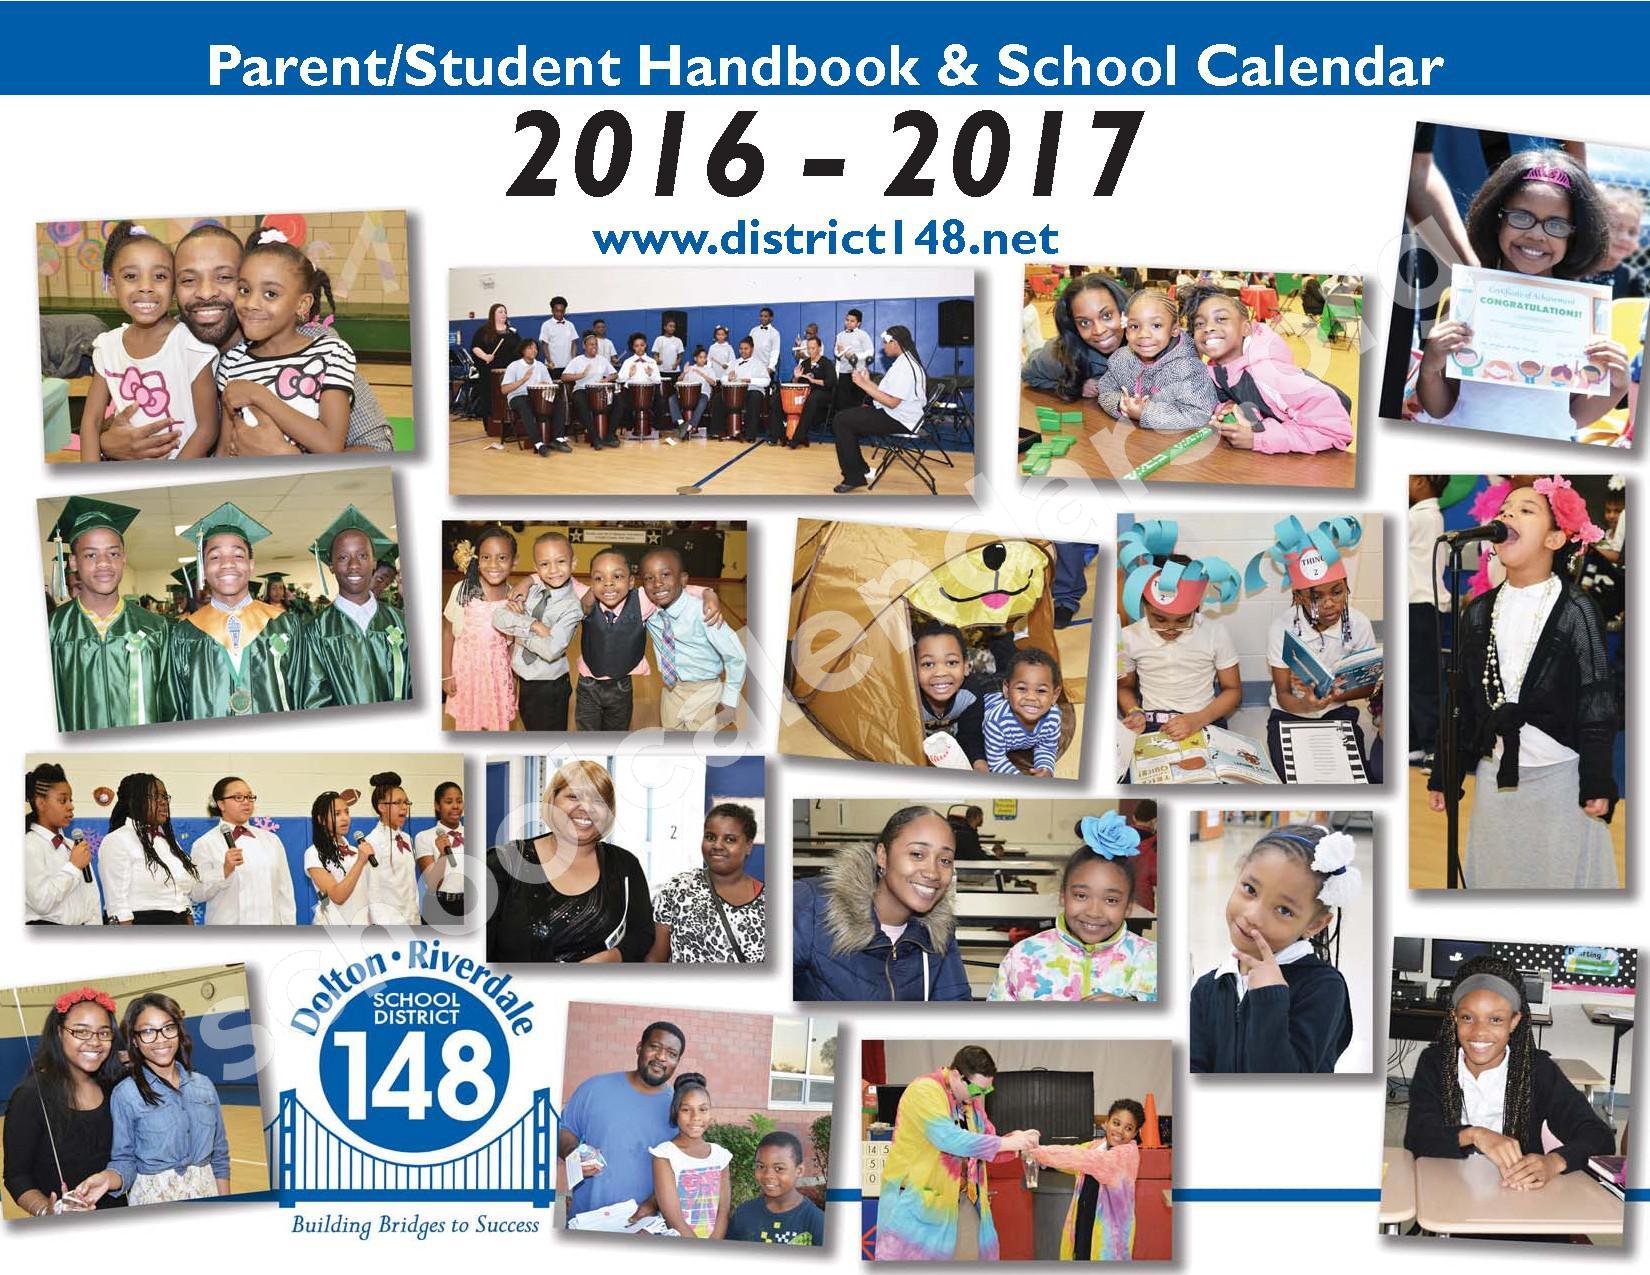 2016 - 2017 Parent/Student Handbook – Roosevelt Elementary School – page 1